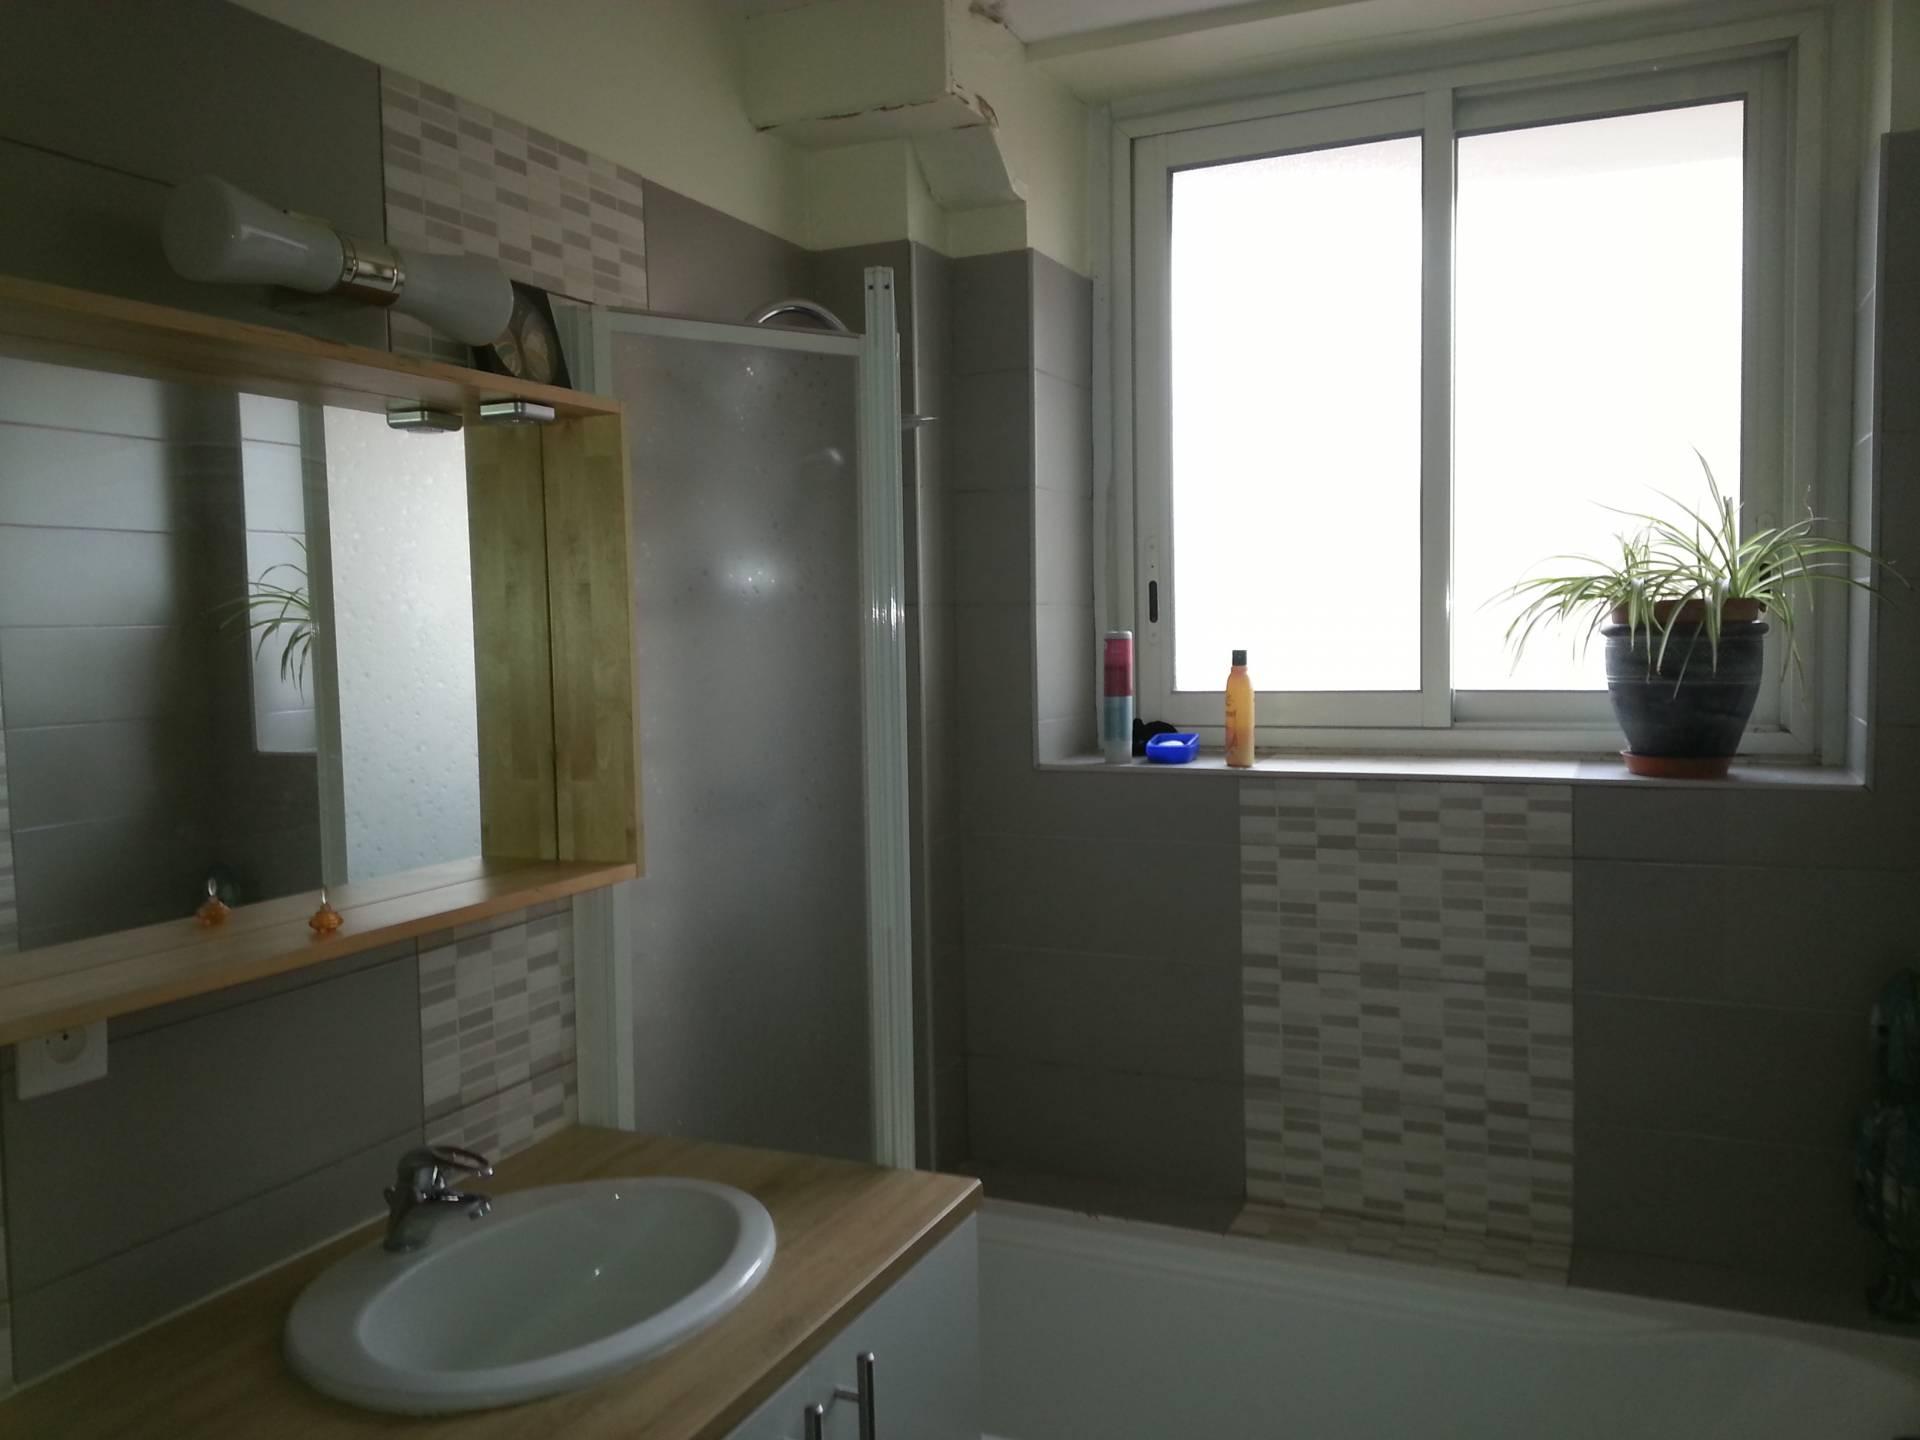 Appartement T3 Toulouse proche gare Matabiau